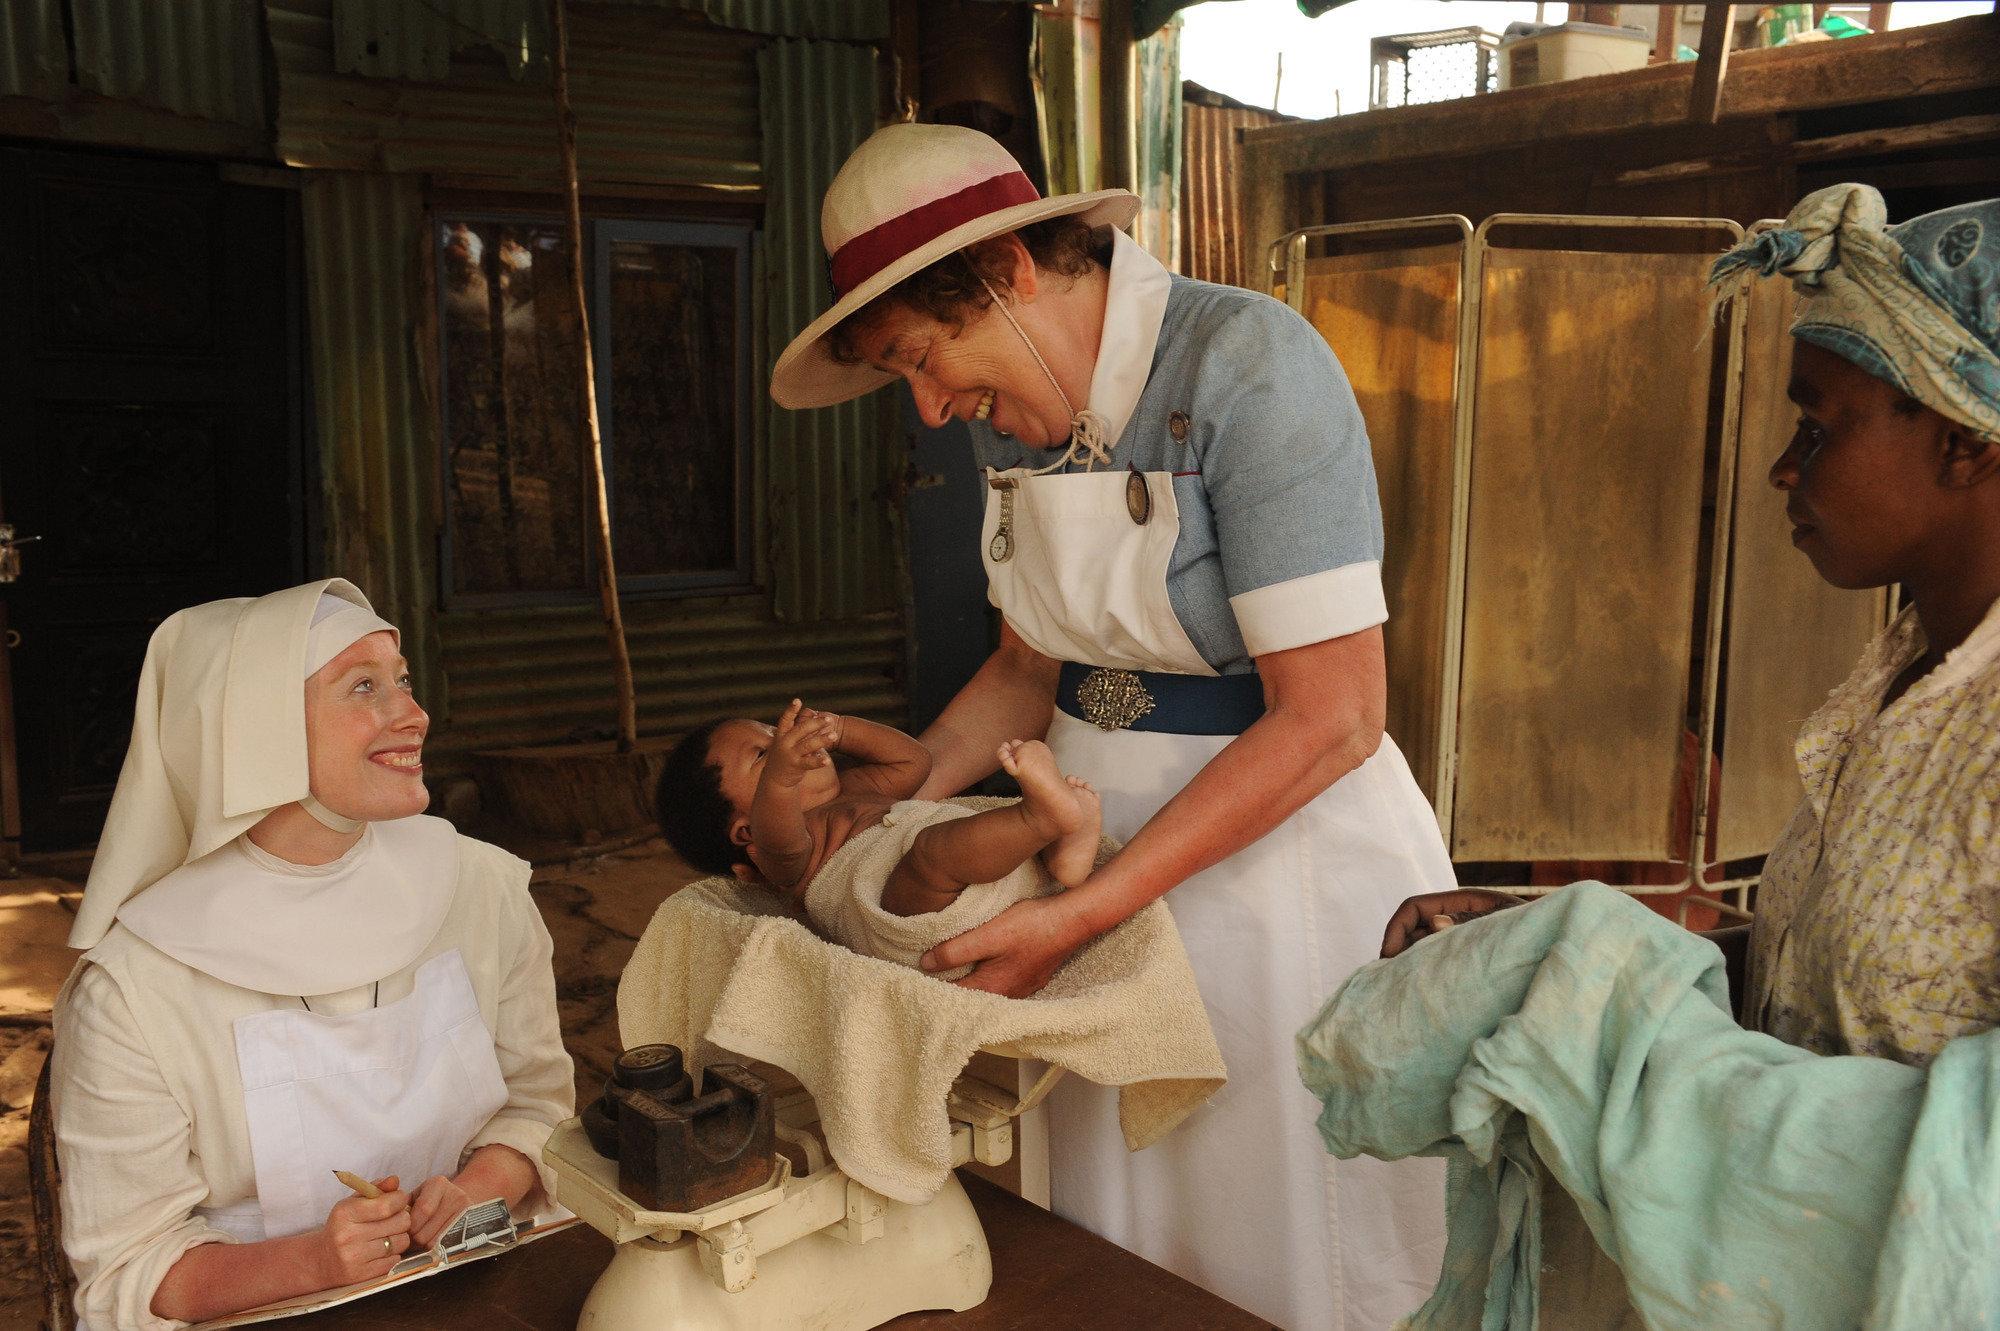 Sister Winifred (Victoria Yeates) and Nurse Crane (Linda